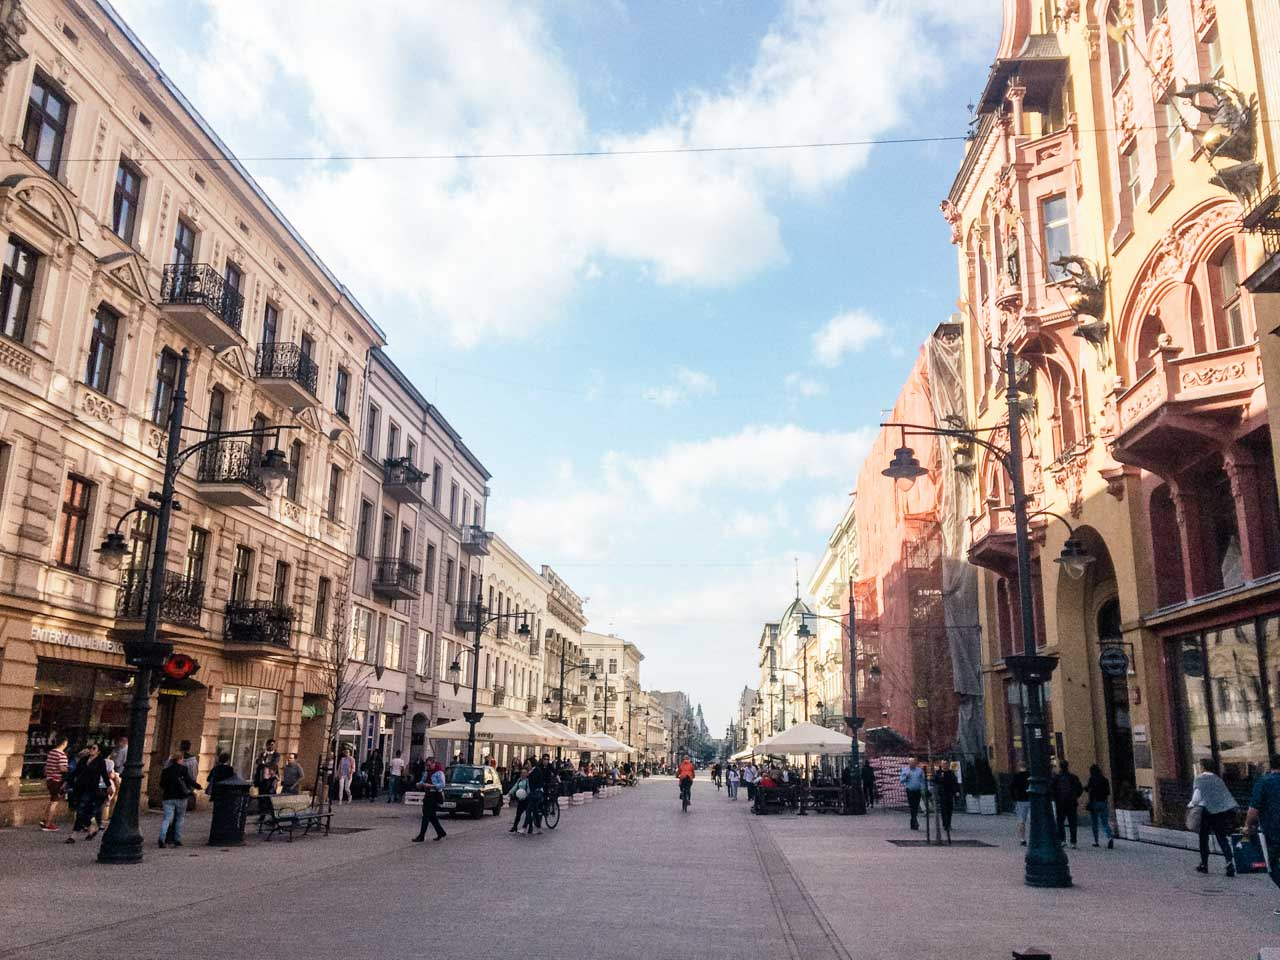 Piotrkowska Street in Łódź, Poland